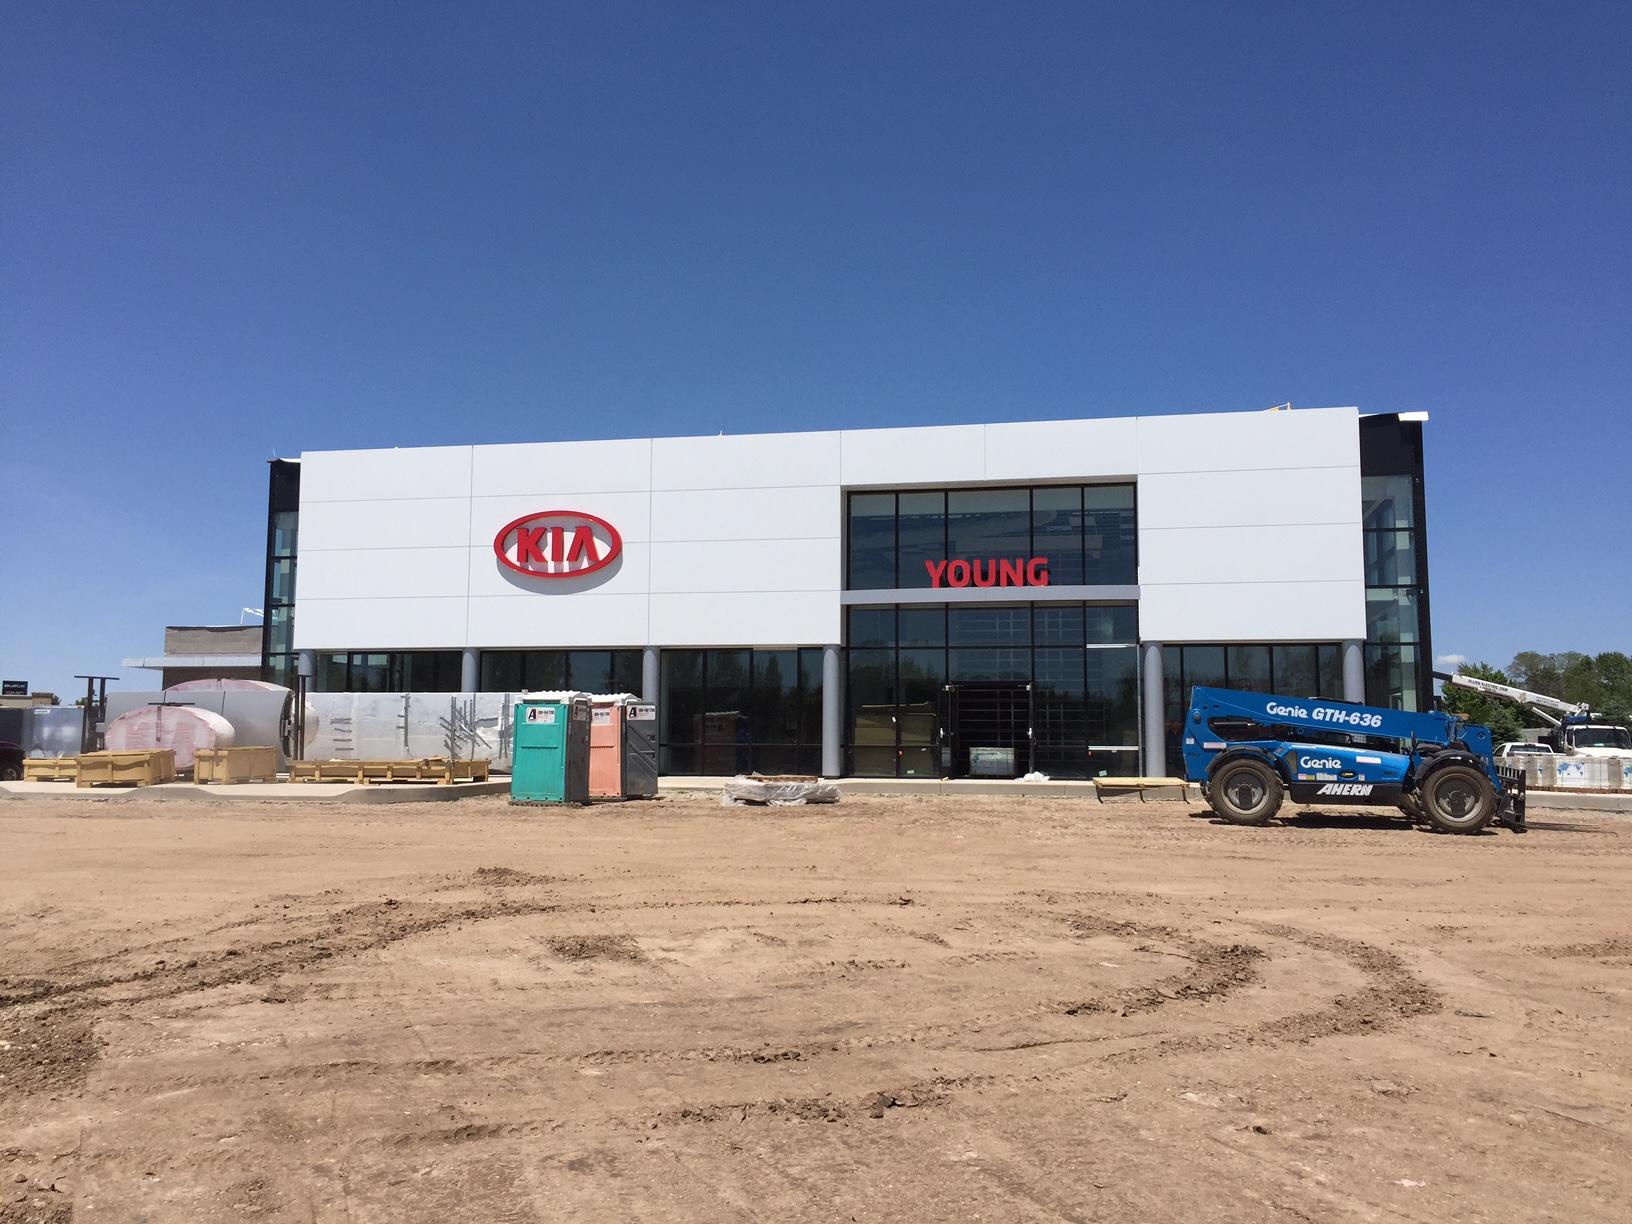 Young Kia Update On New Dealership In Layton Utah